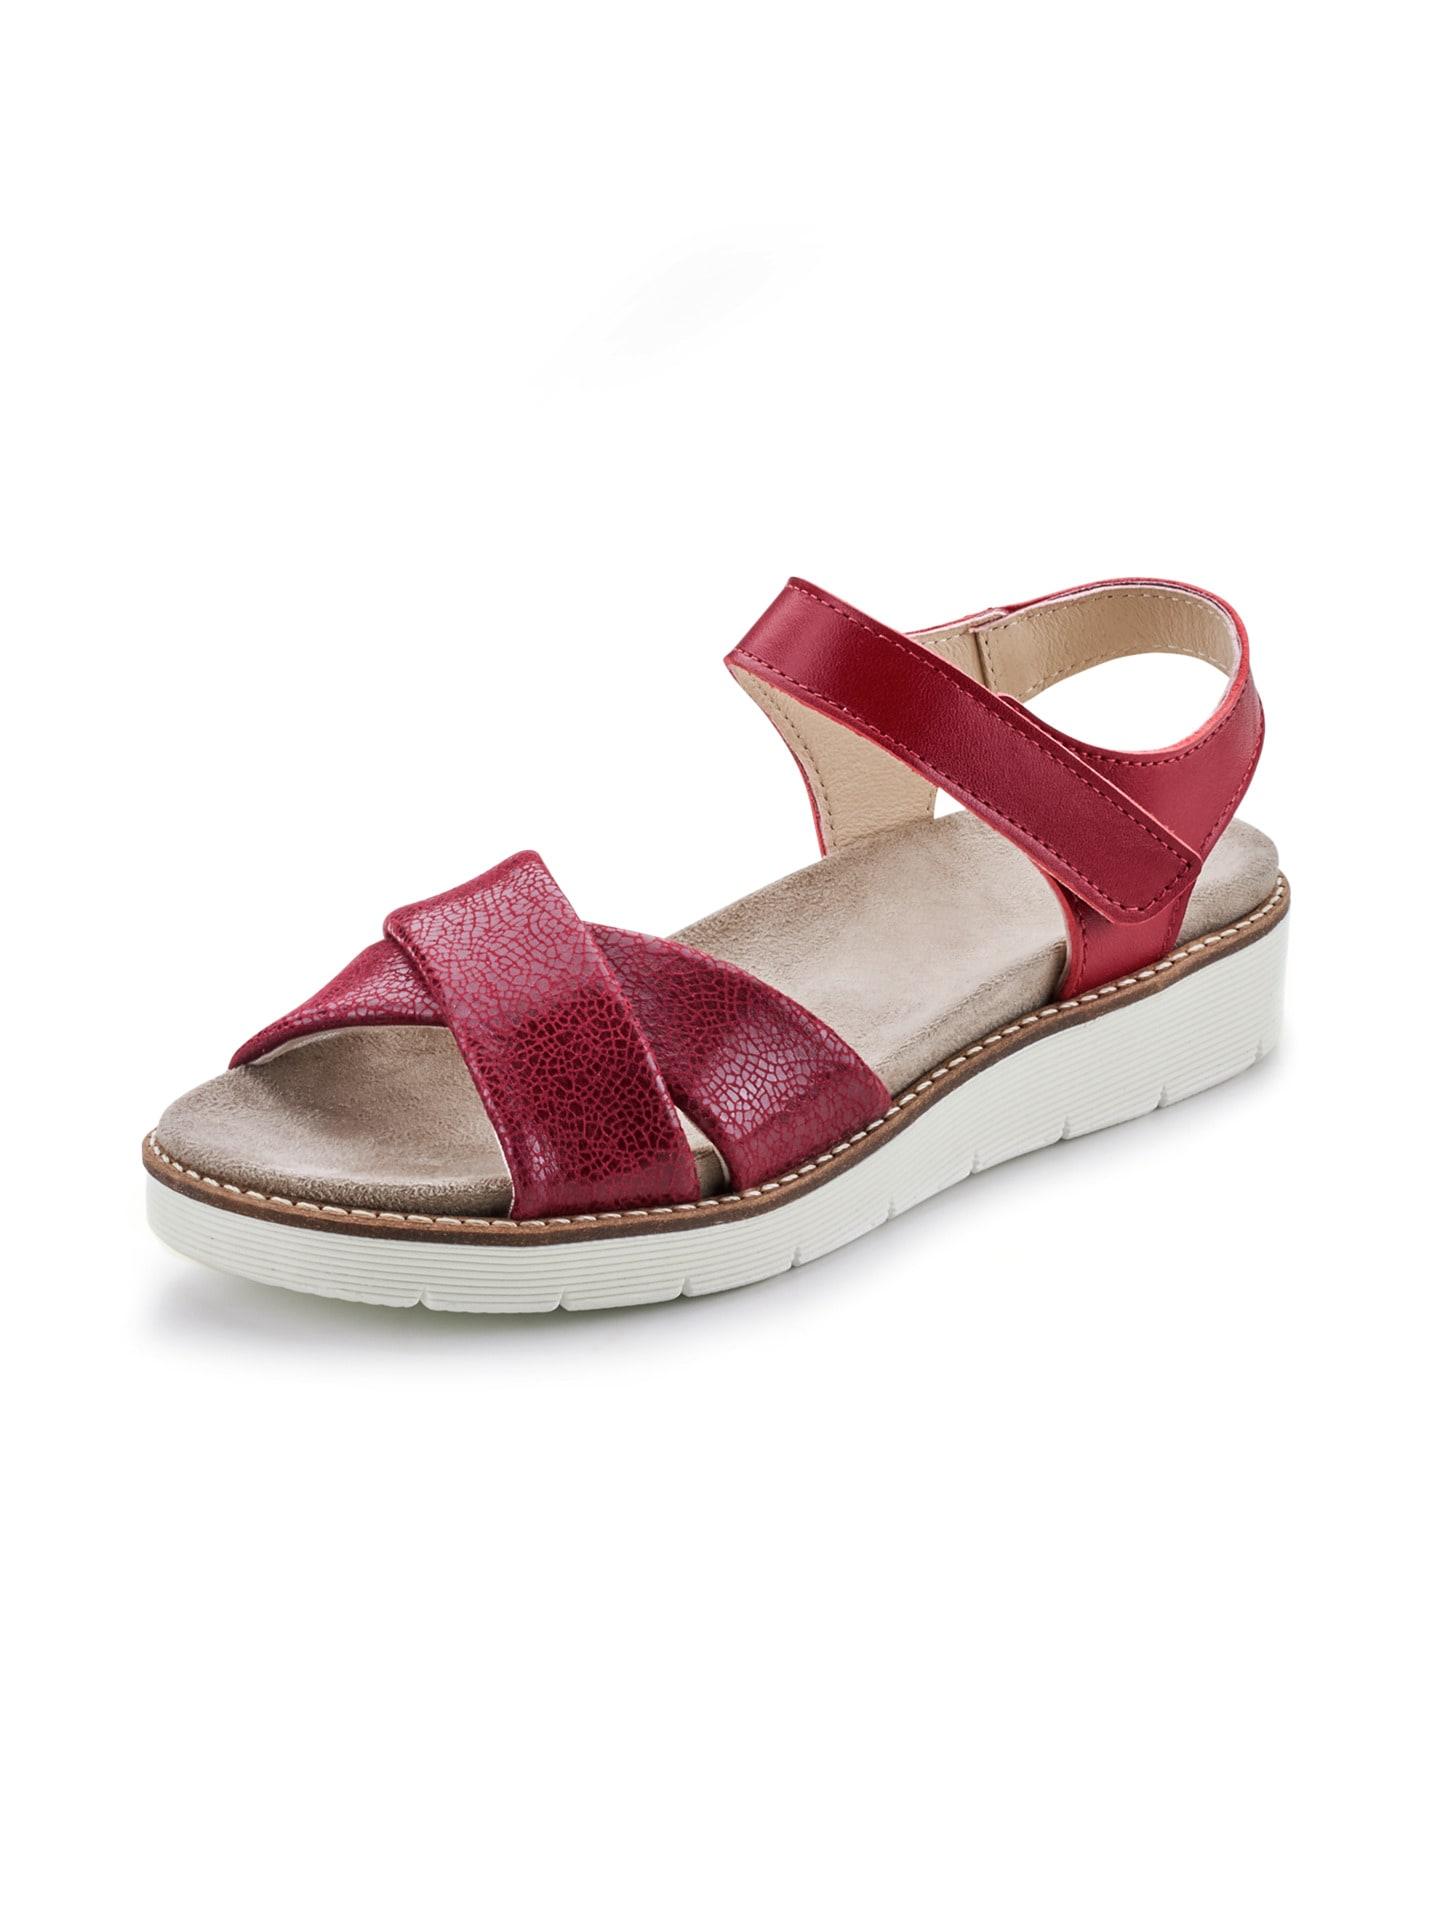 Avena Damen Hallux-Sandale Softness Rot 45-7876-7